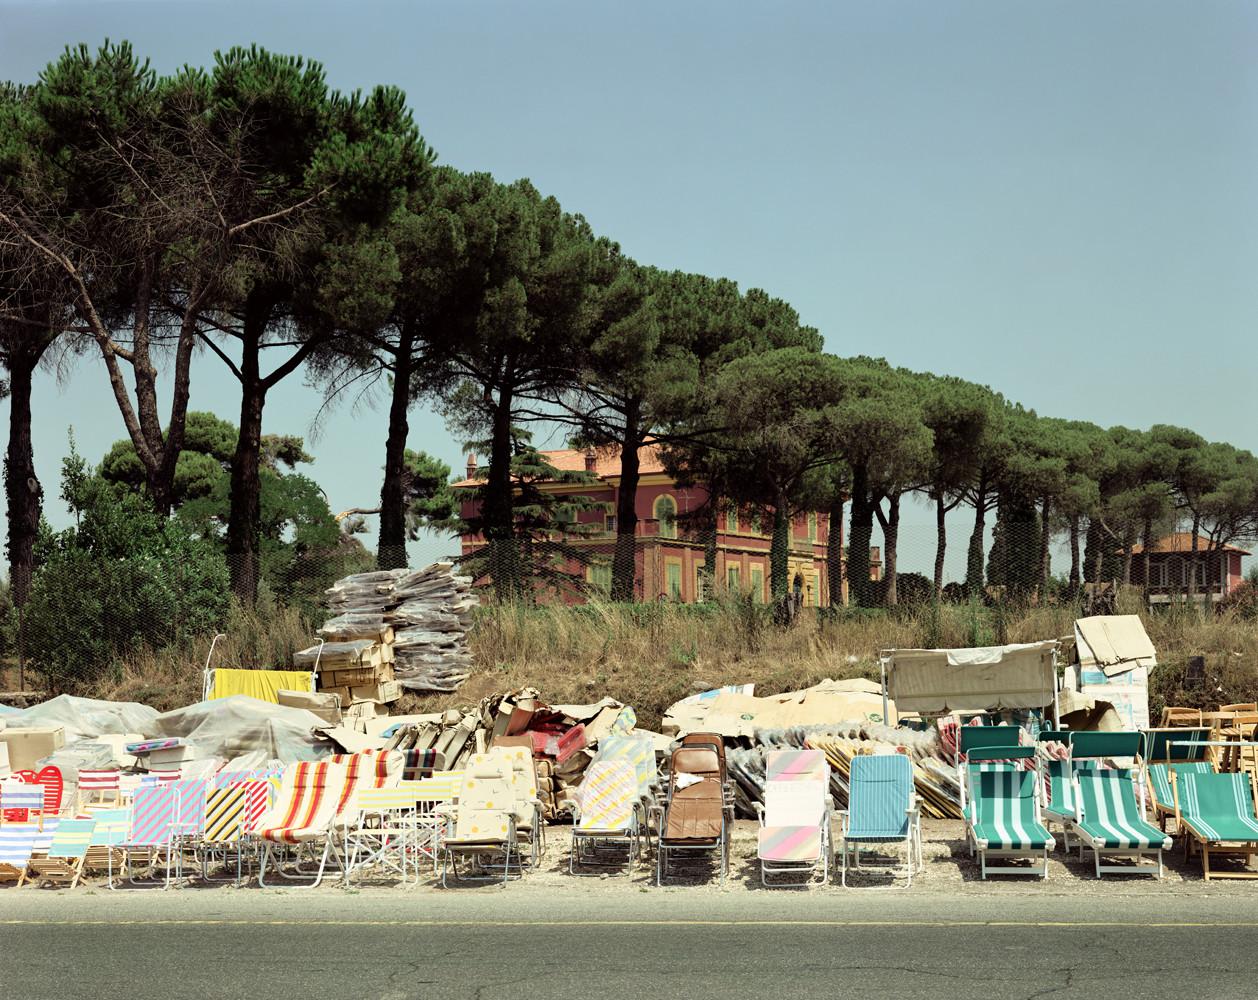 Joel Sternfeld, 'Via Appia Nuova, Statuario, Rome, August', 1989